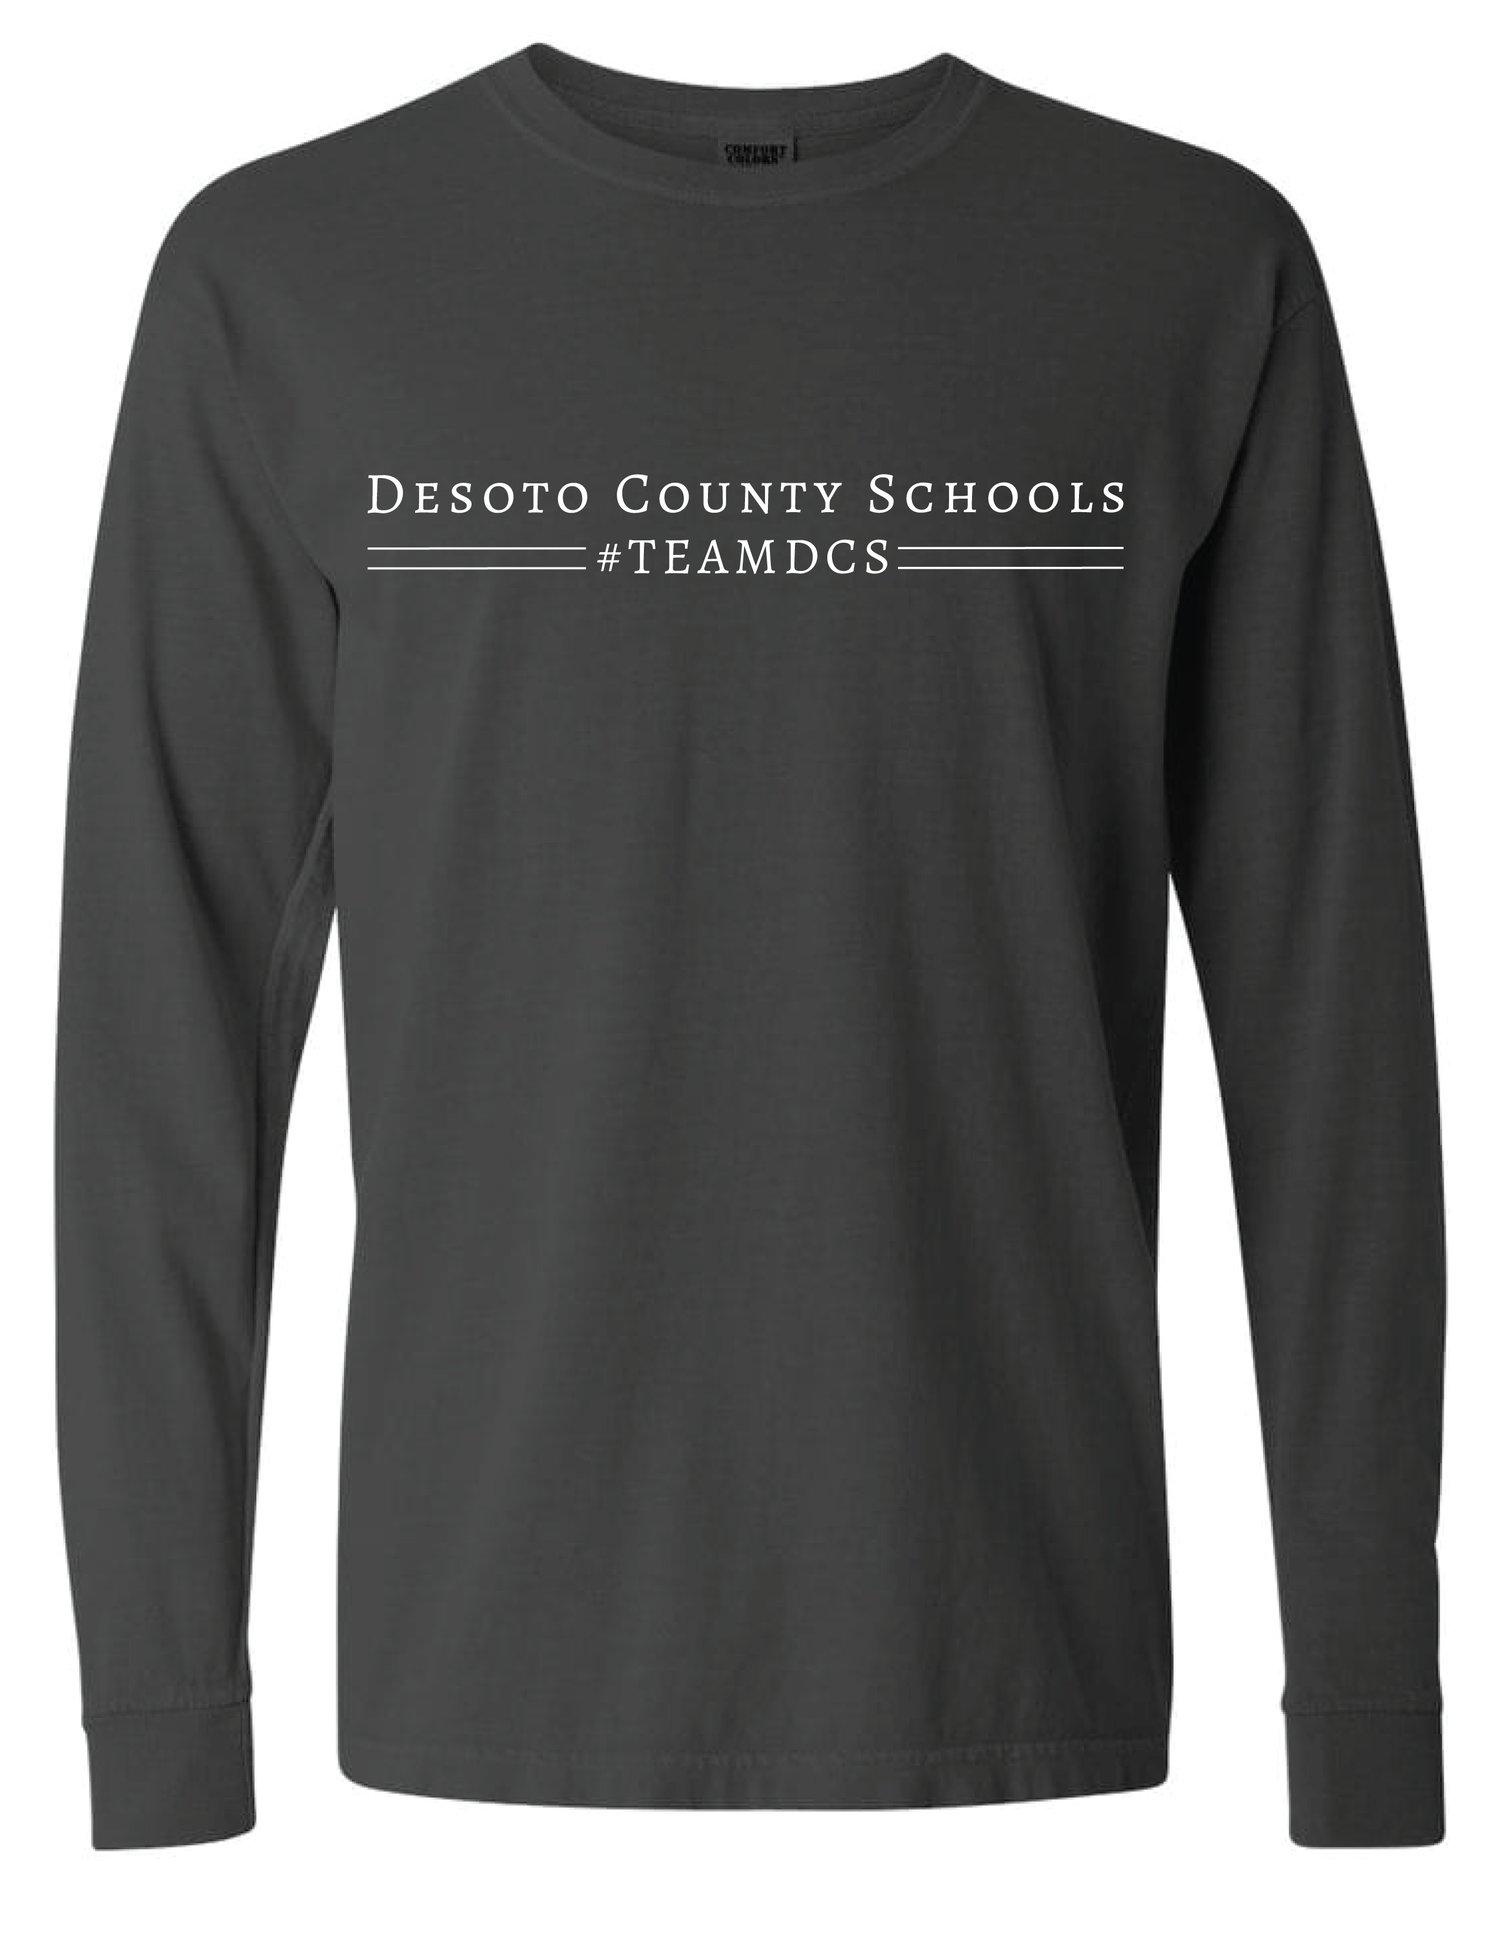 Image of Desoto County Schools #TEAMDCS - Charcoal